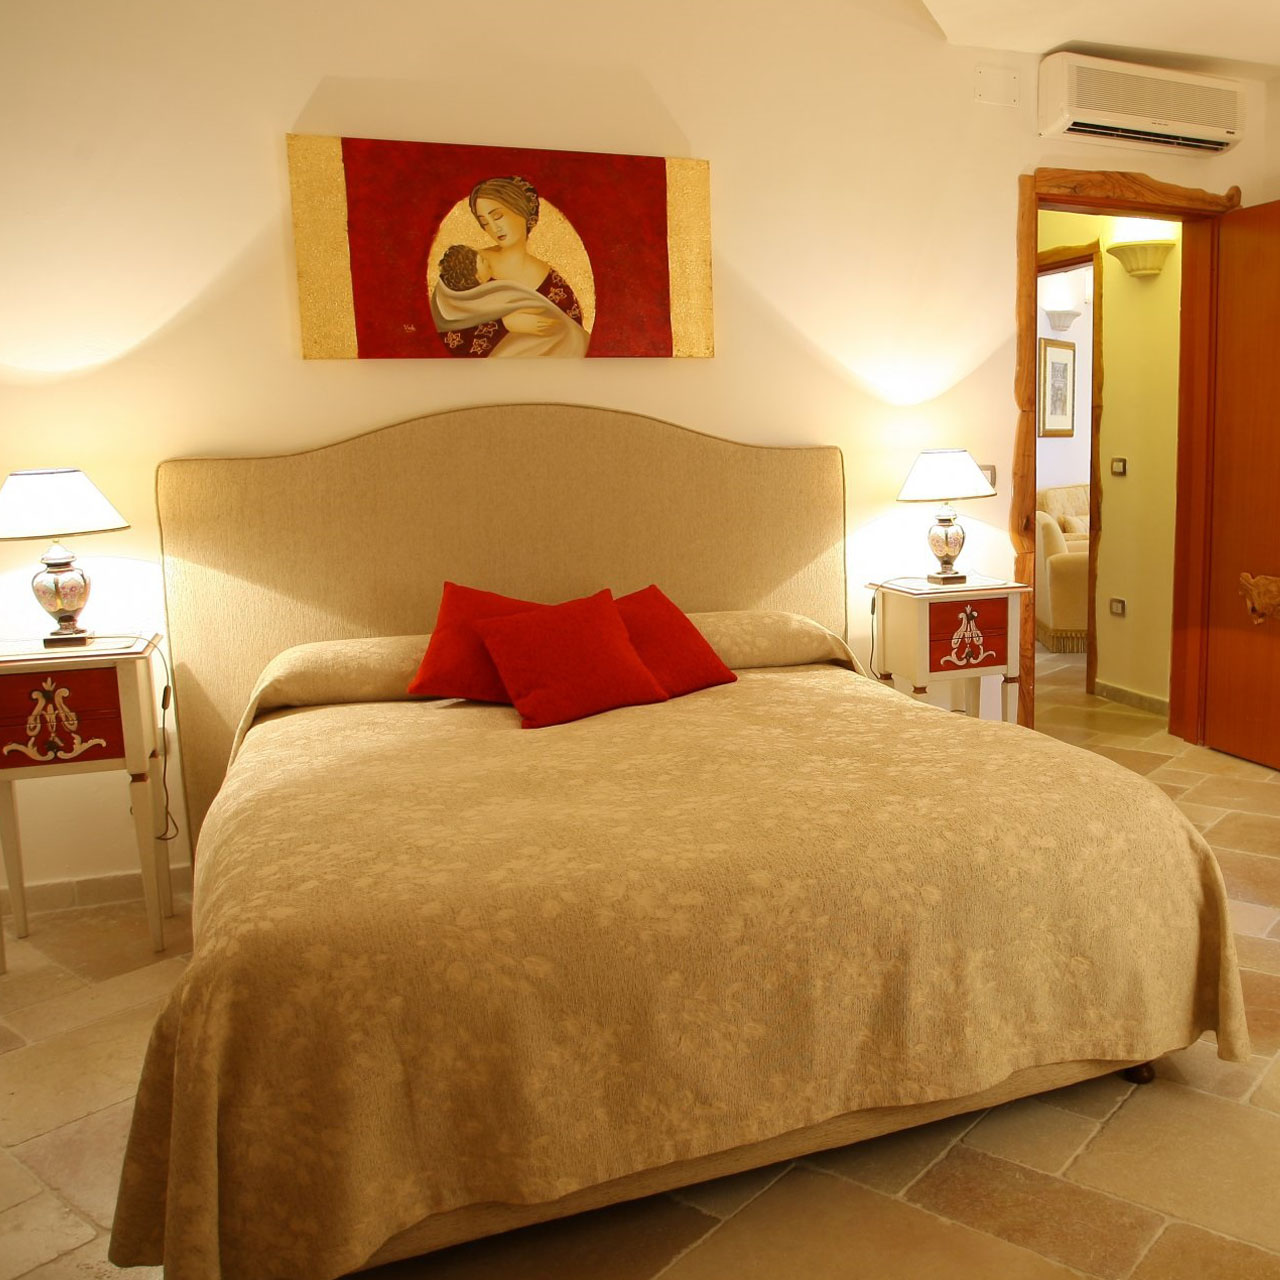 Hotel Felicita, Apulia, Italy